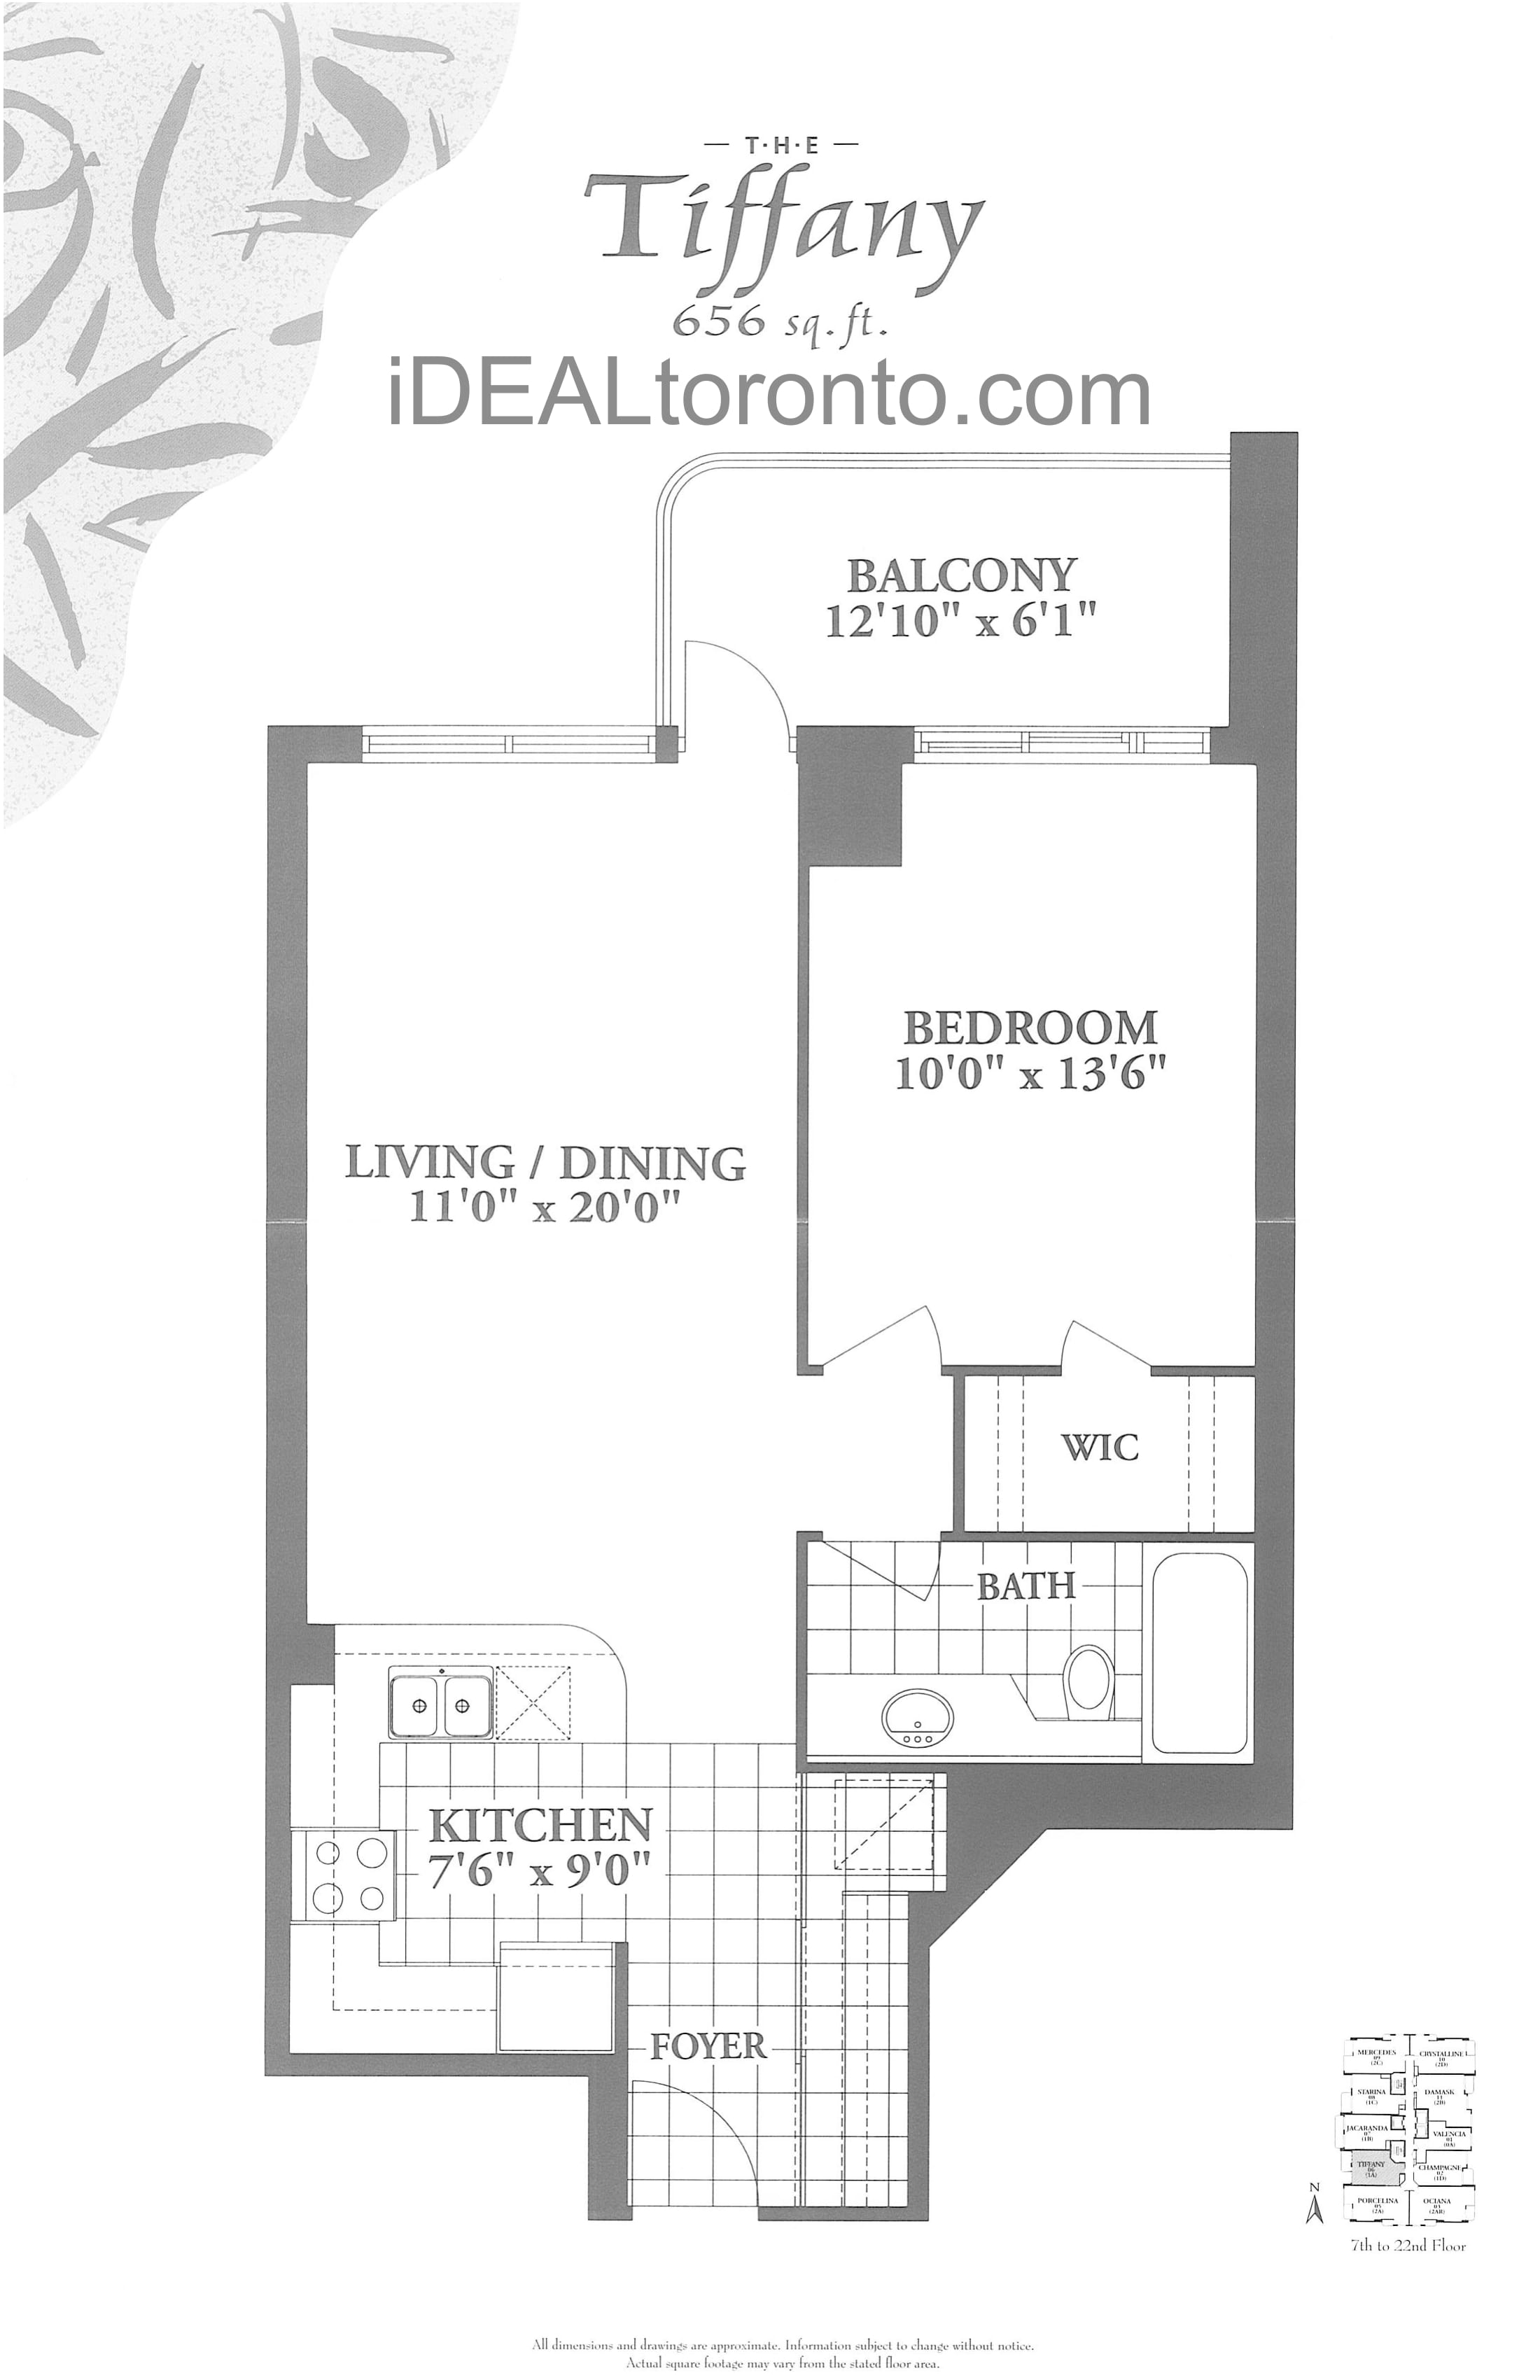 The Tiffany: 1 Bedroom, 656 SqFt